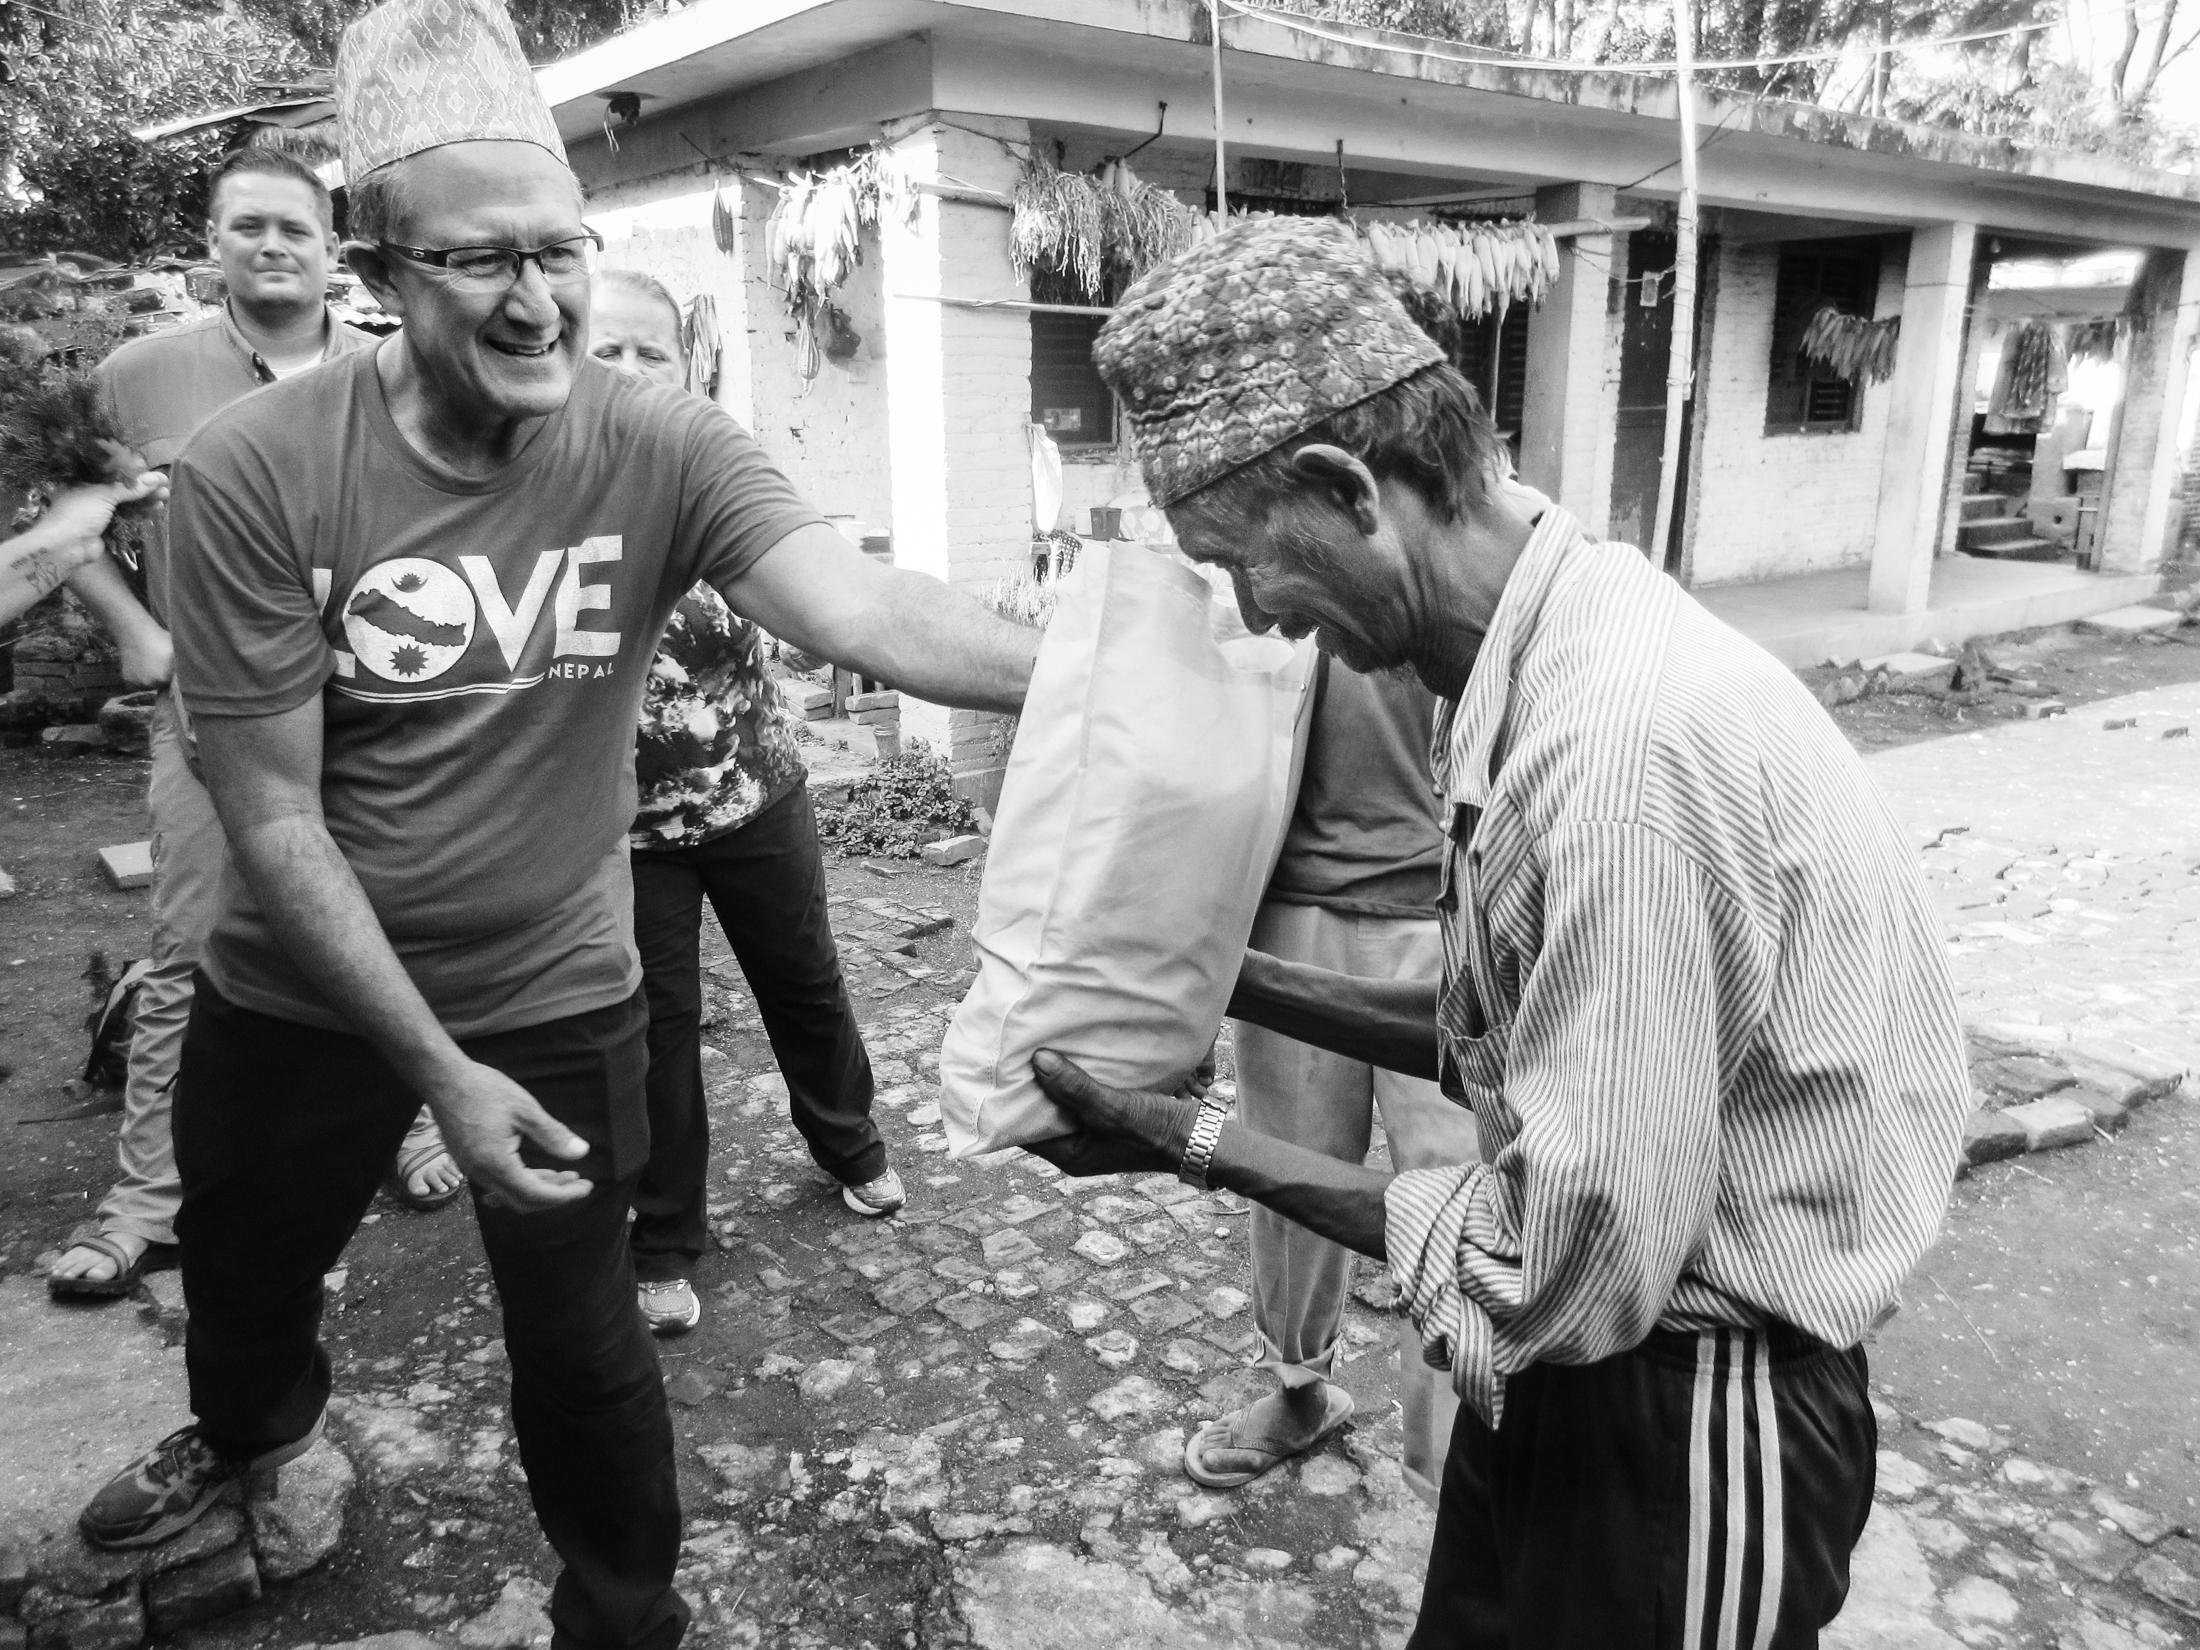 Tom Gallardo of Gallardo and Associates performing outreach in Khokana Leprosy Colony in Nepal.